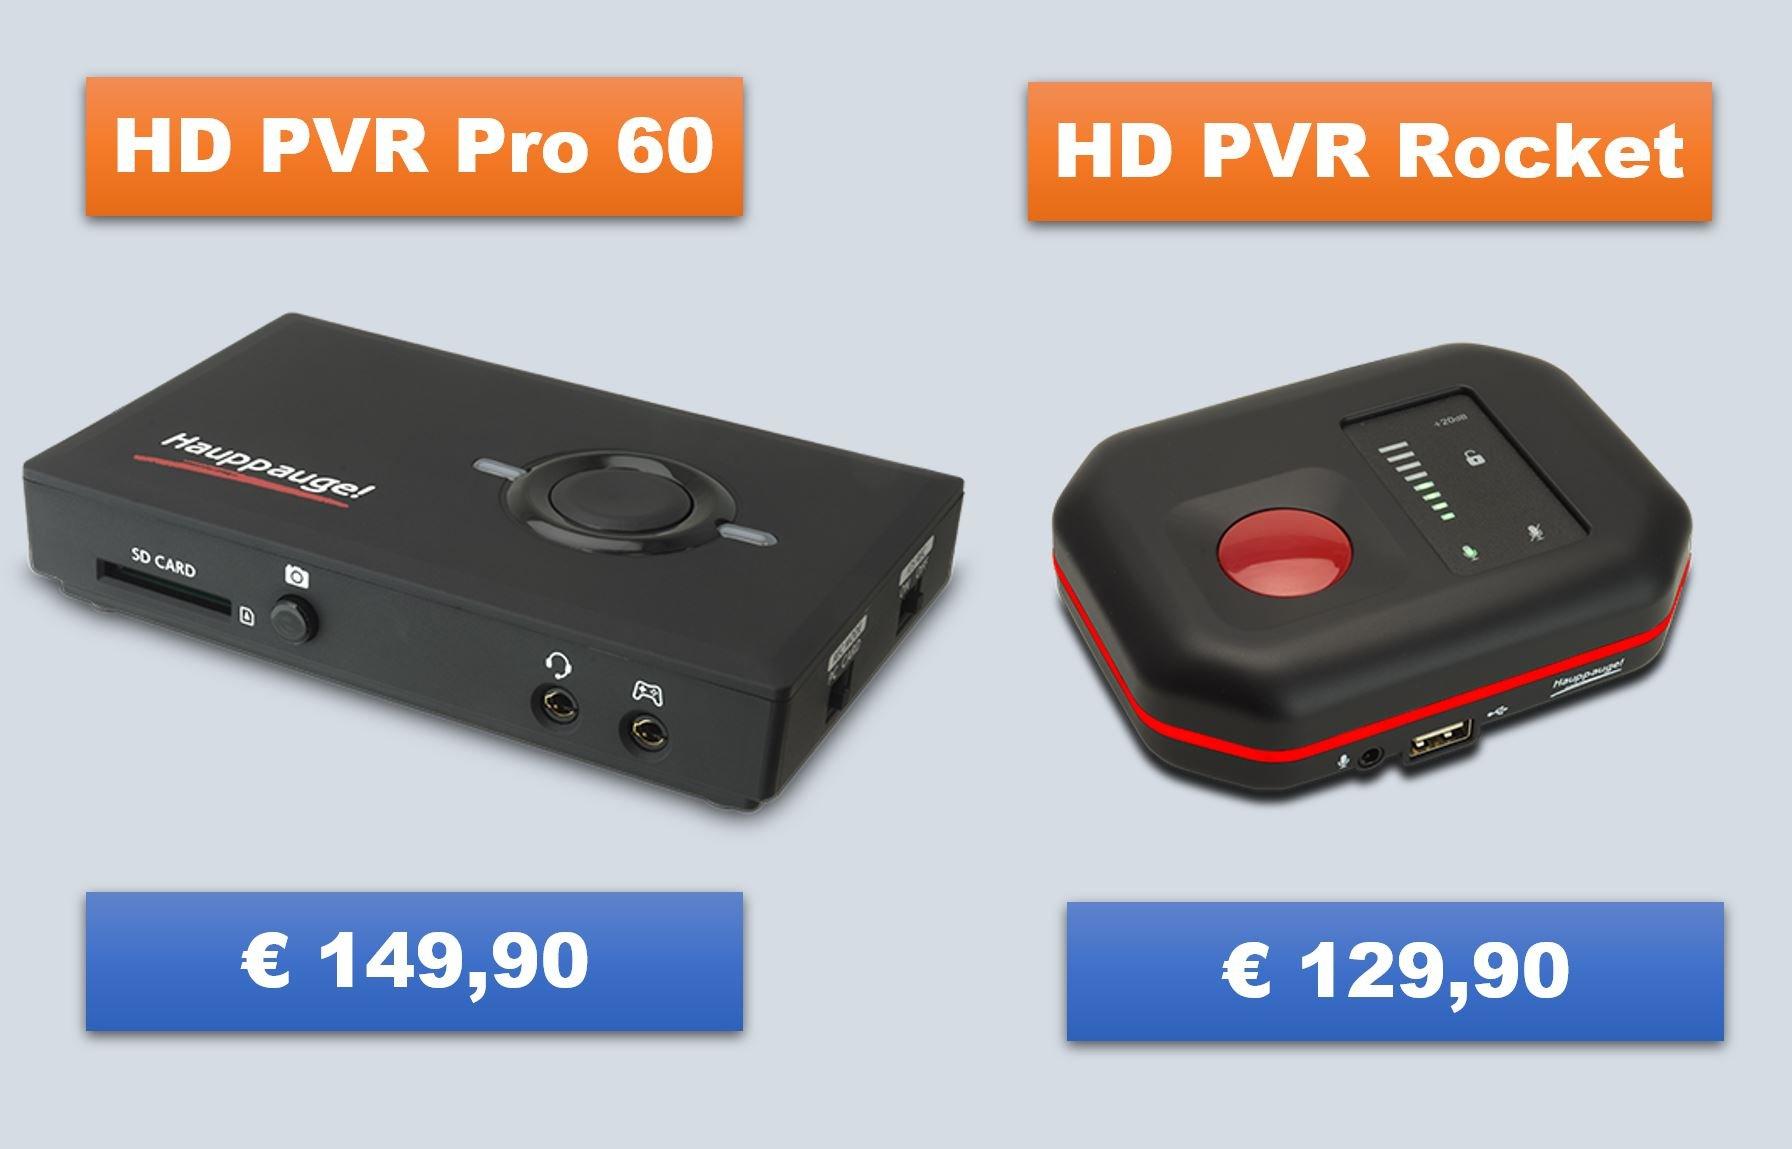 HD PVR Pro 60 vs HD PVR Rocket